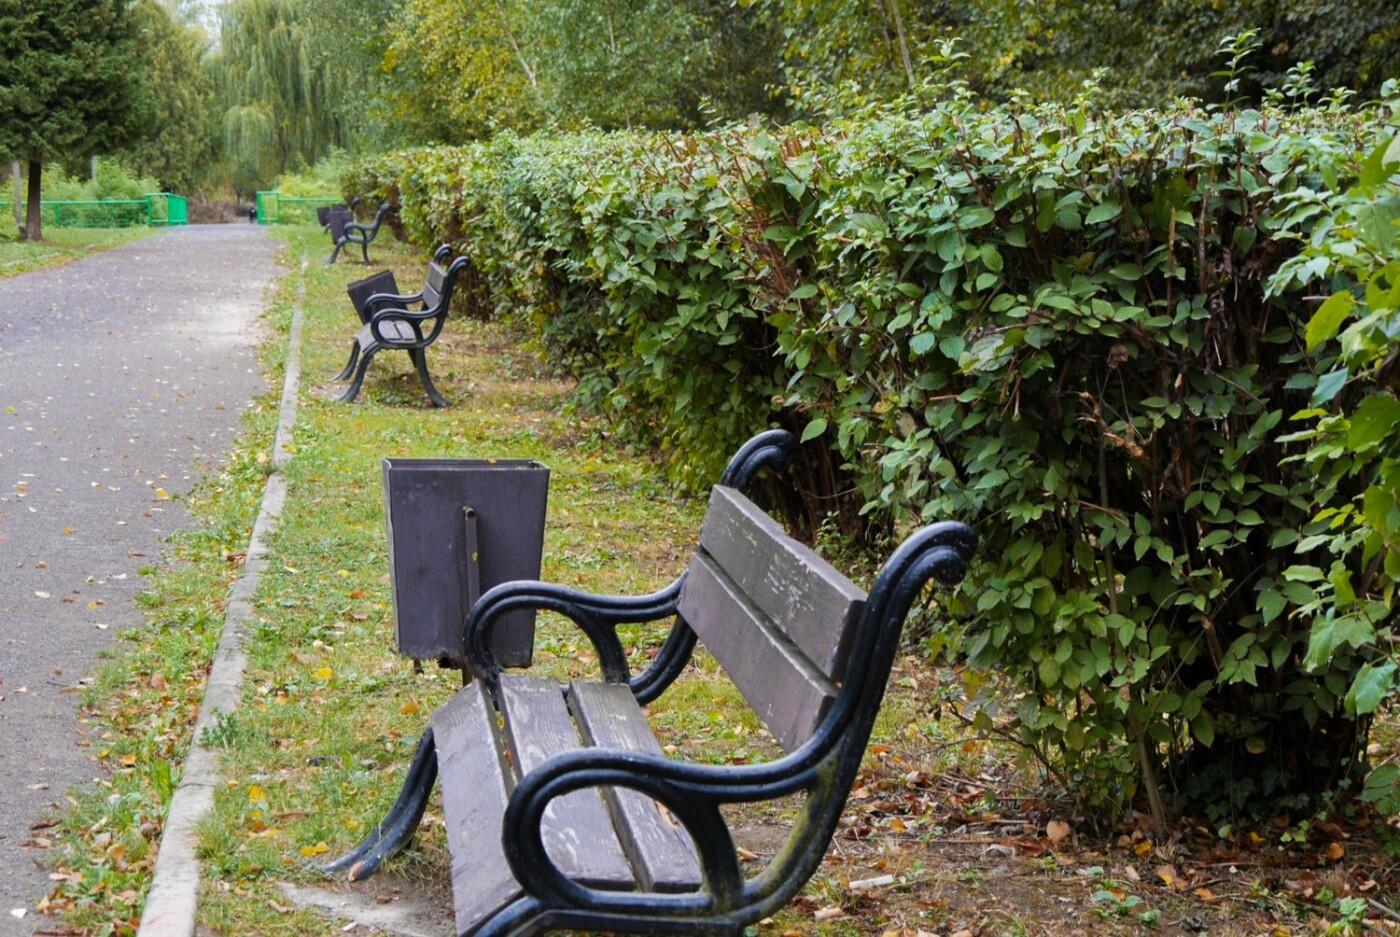 Ще одну алею у Боздоському парку Ужгорода привели до ладу (ФОТО), фото-4